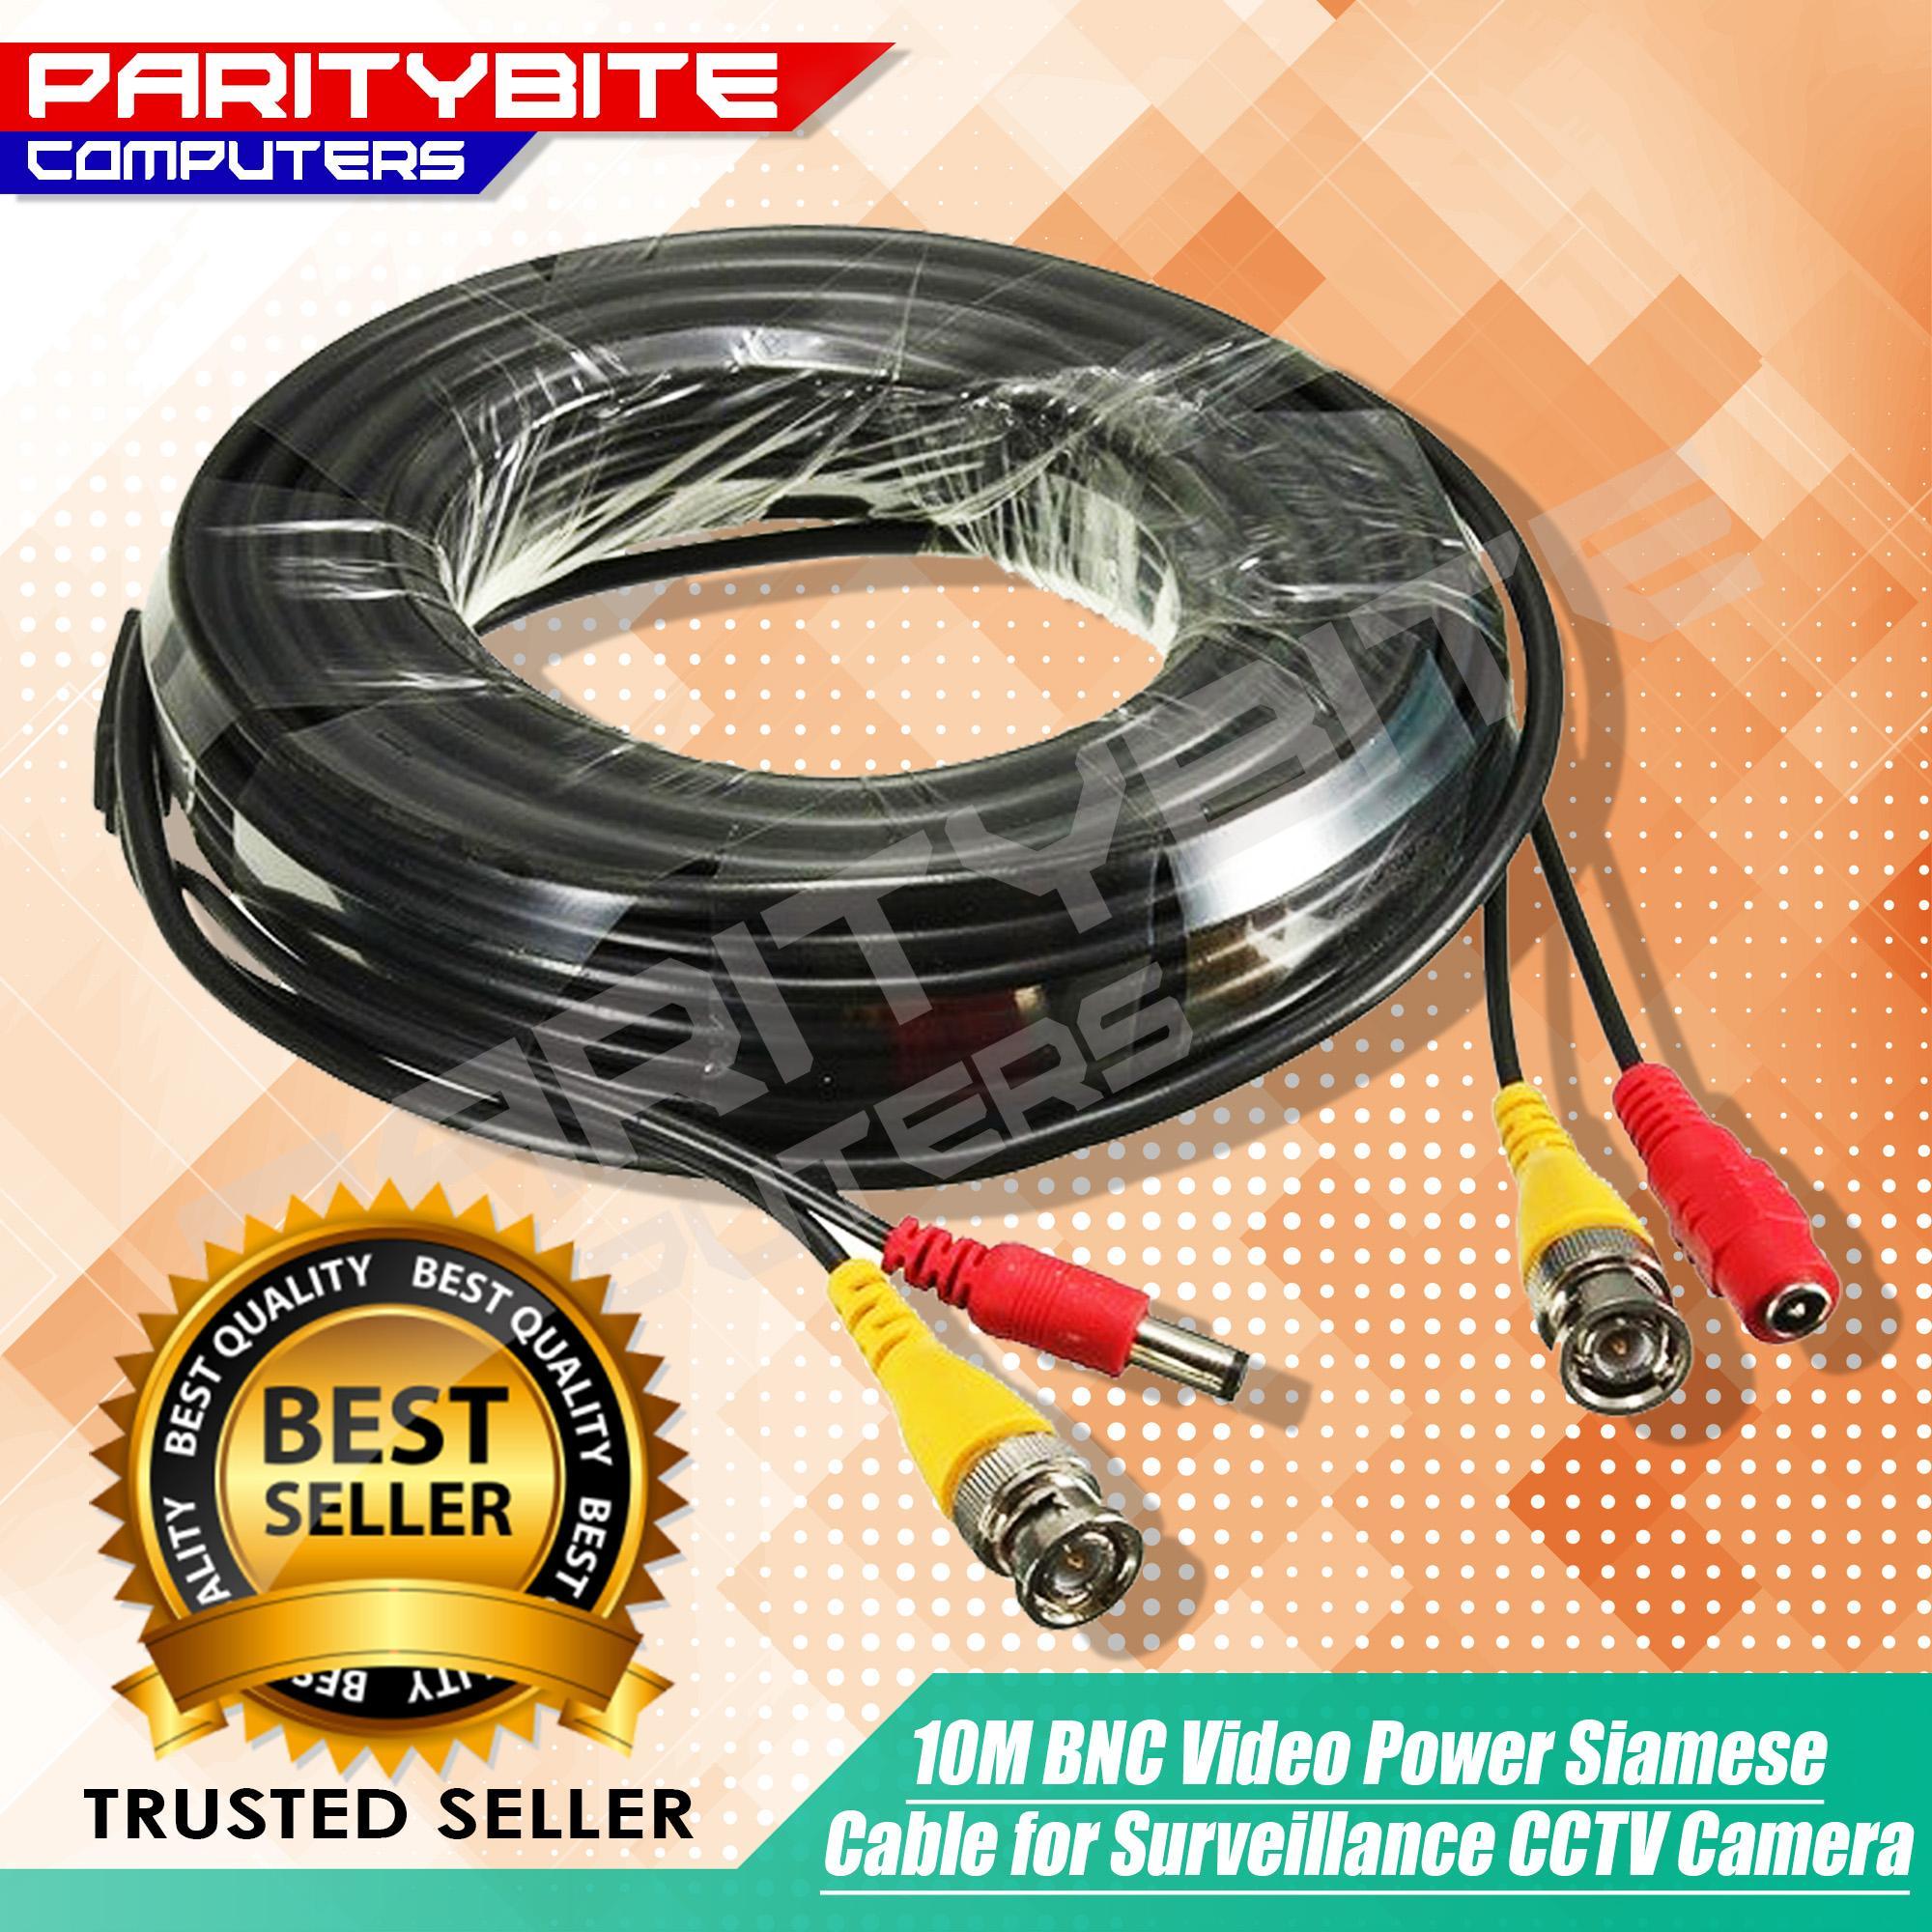 10m BNC Video Power Siamese Cable for Surveillance CCTV Camera